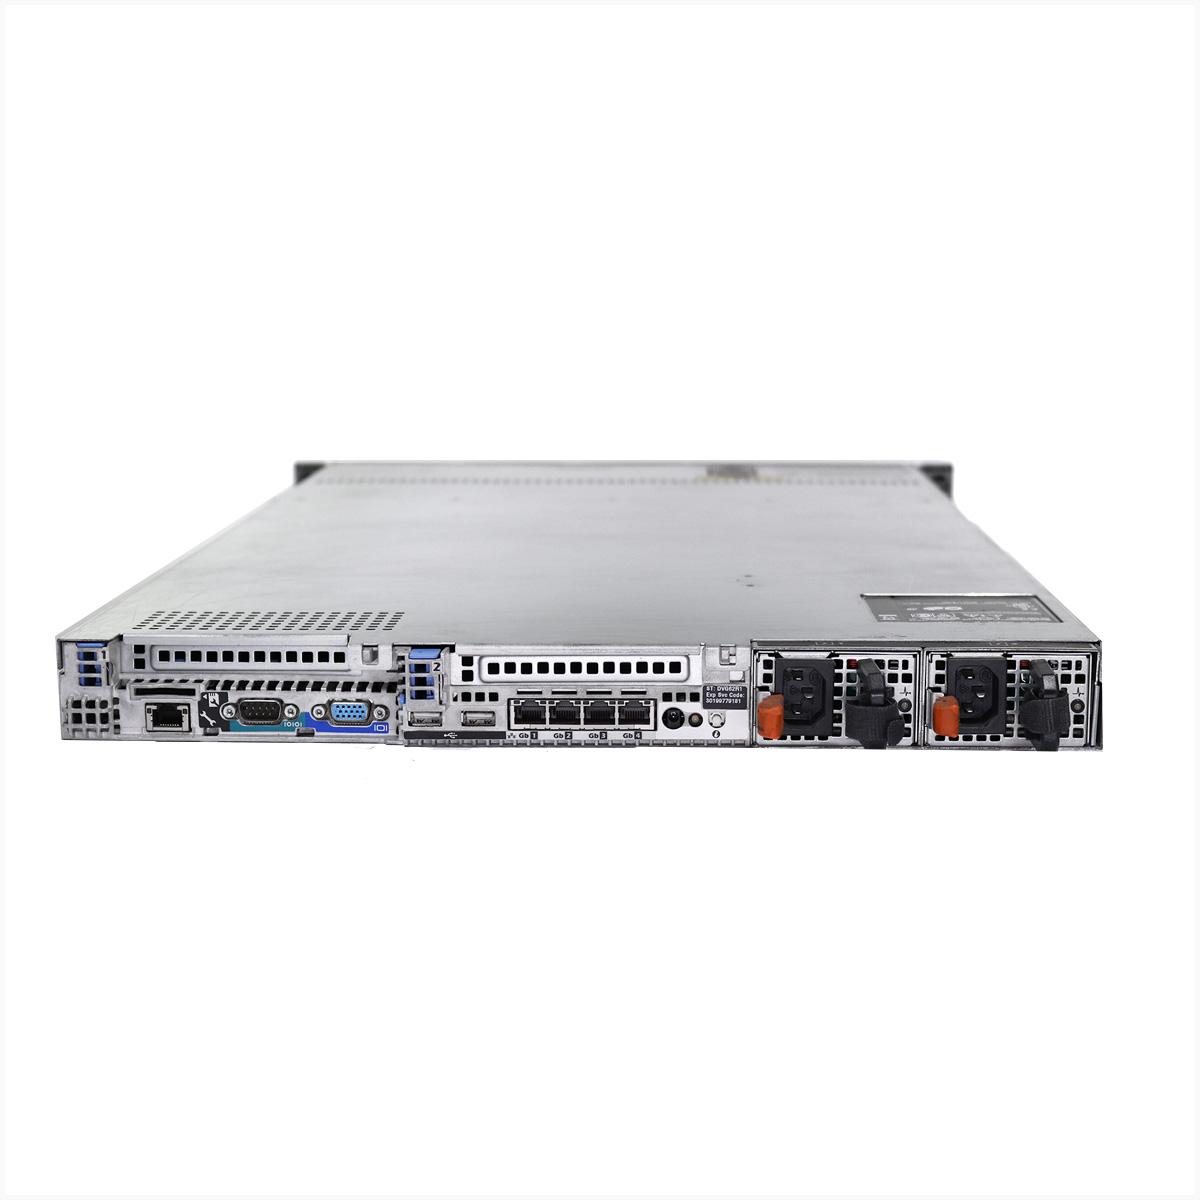 Servidor dell poweredge r610 2x xeon e5645 64gb 2x 1tb sas - usado